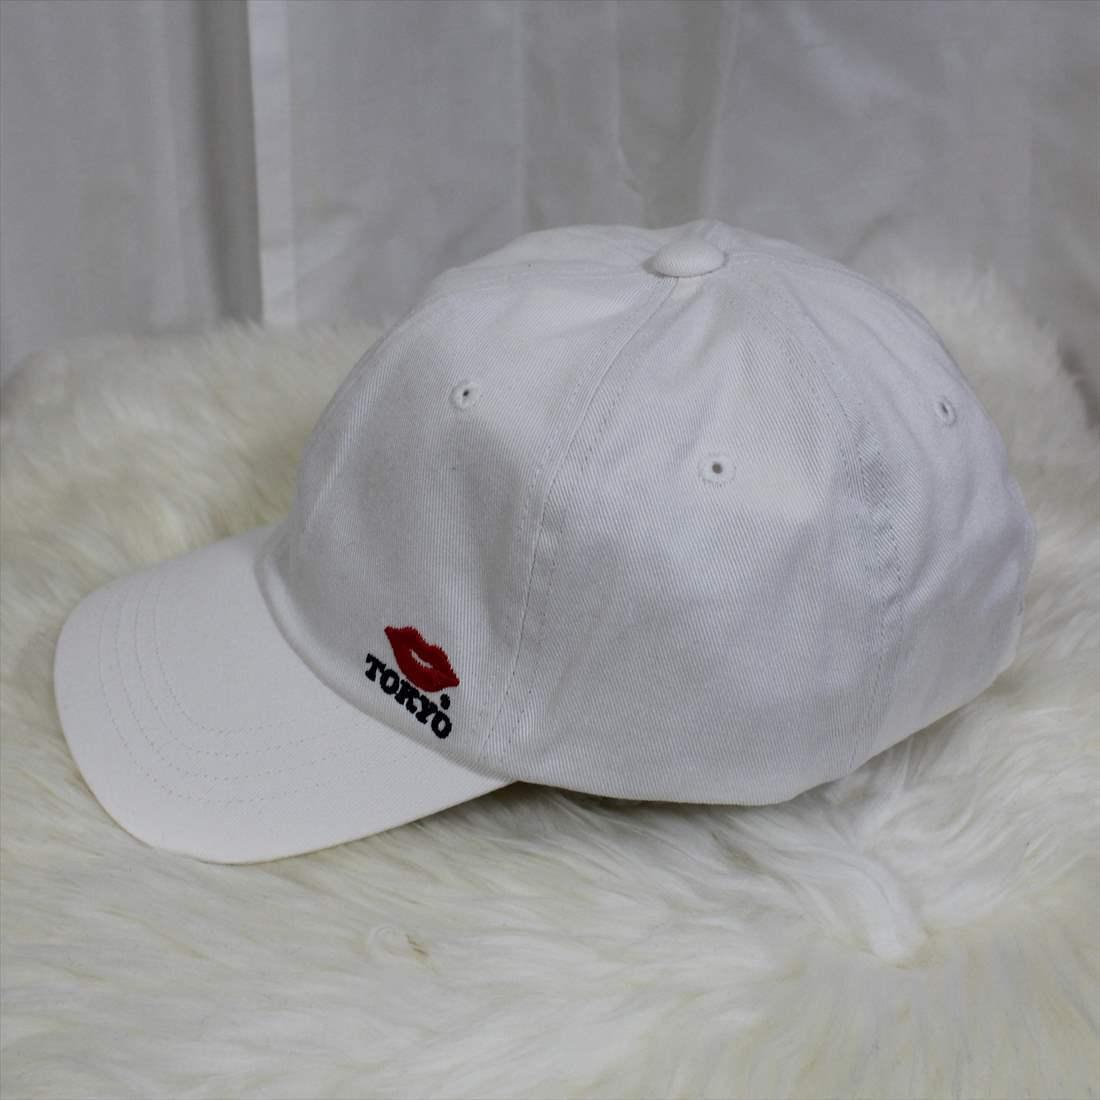 KISS TOKYO LIP LOGO LOW CAP サイドロゴ刺繍 ホワイト キャップ 新品 白 帽子_画像4